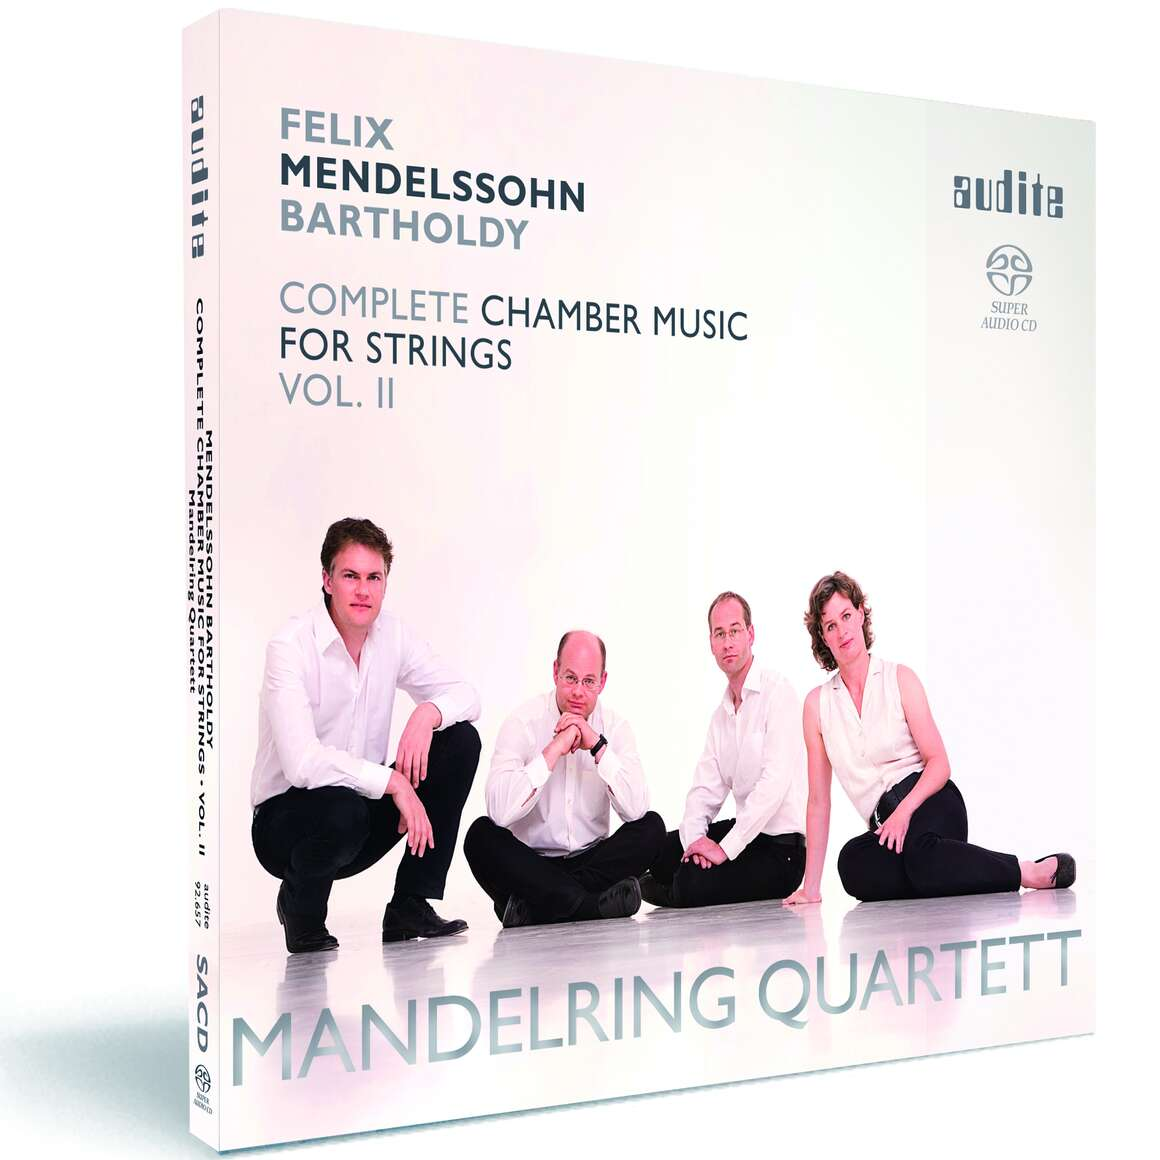 Felix Mendelssohn Bartholdy: String Quartets in D major (Op. 44 No. 1), in E minor (Op. 44 No. 2) & in F minor (Op. 80)